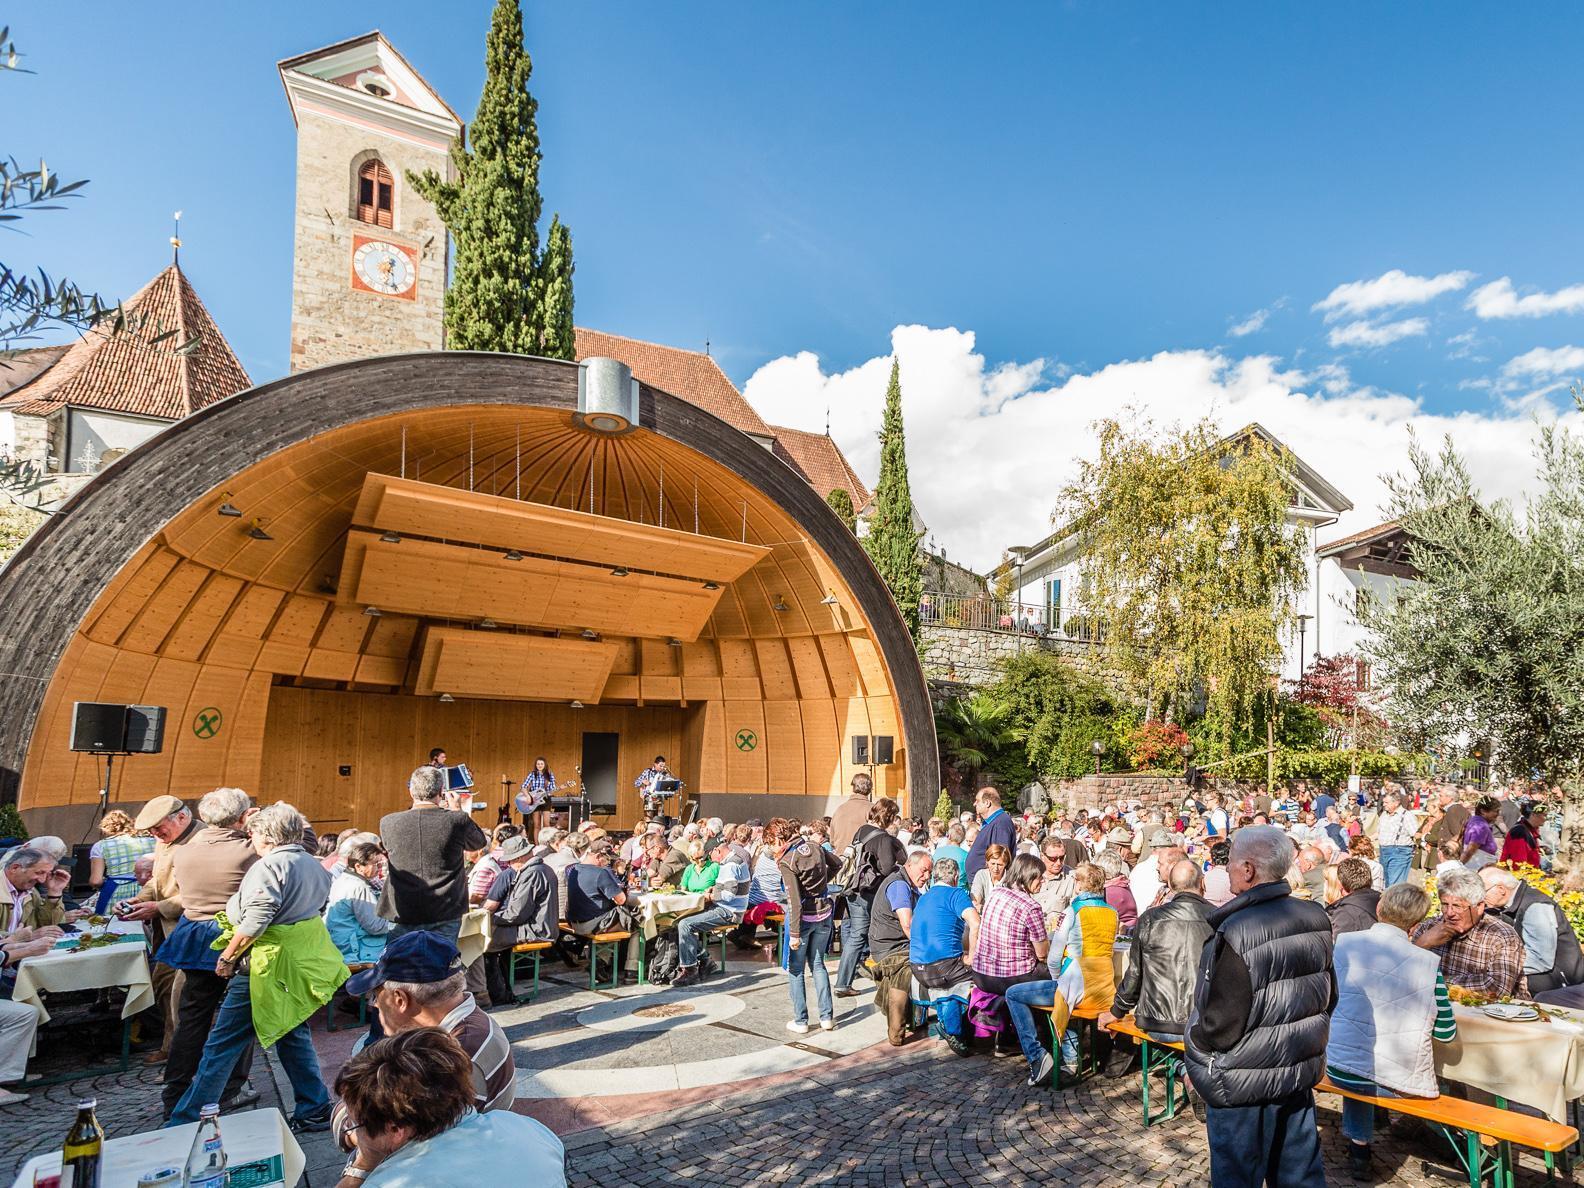 Concerto della banda musicale di Böhmische Albeins